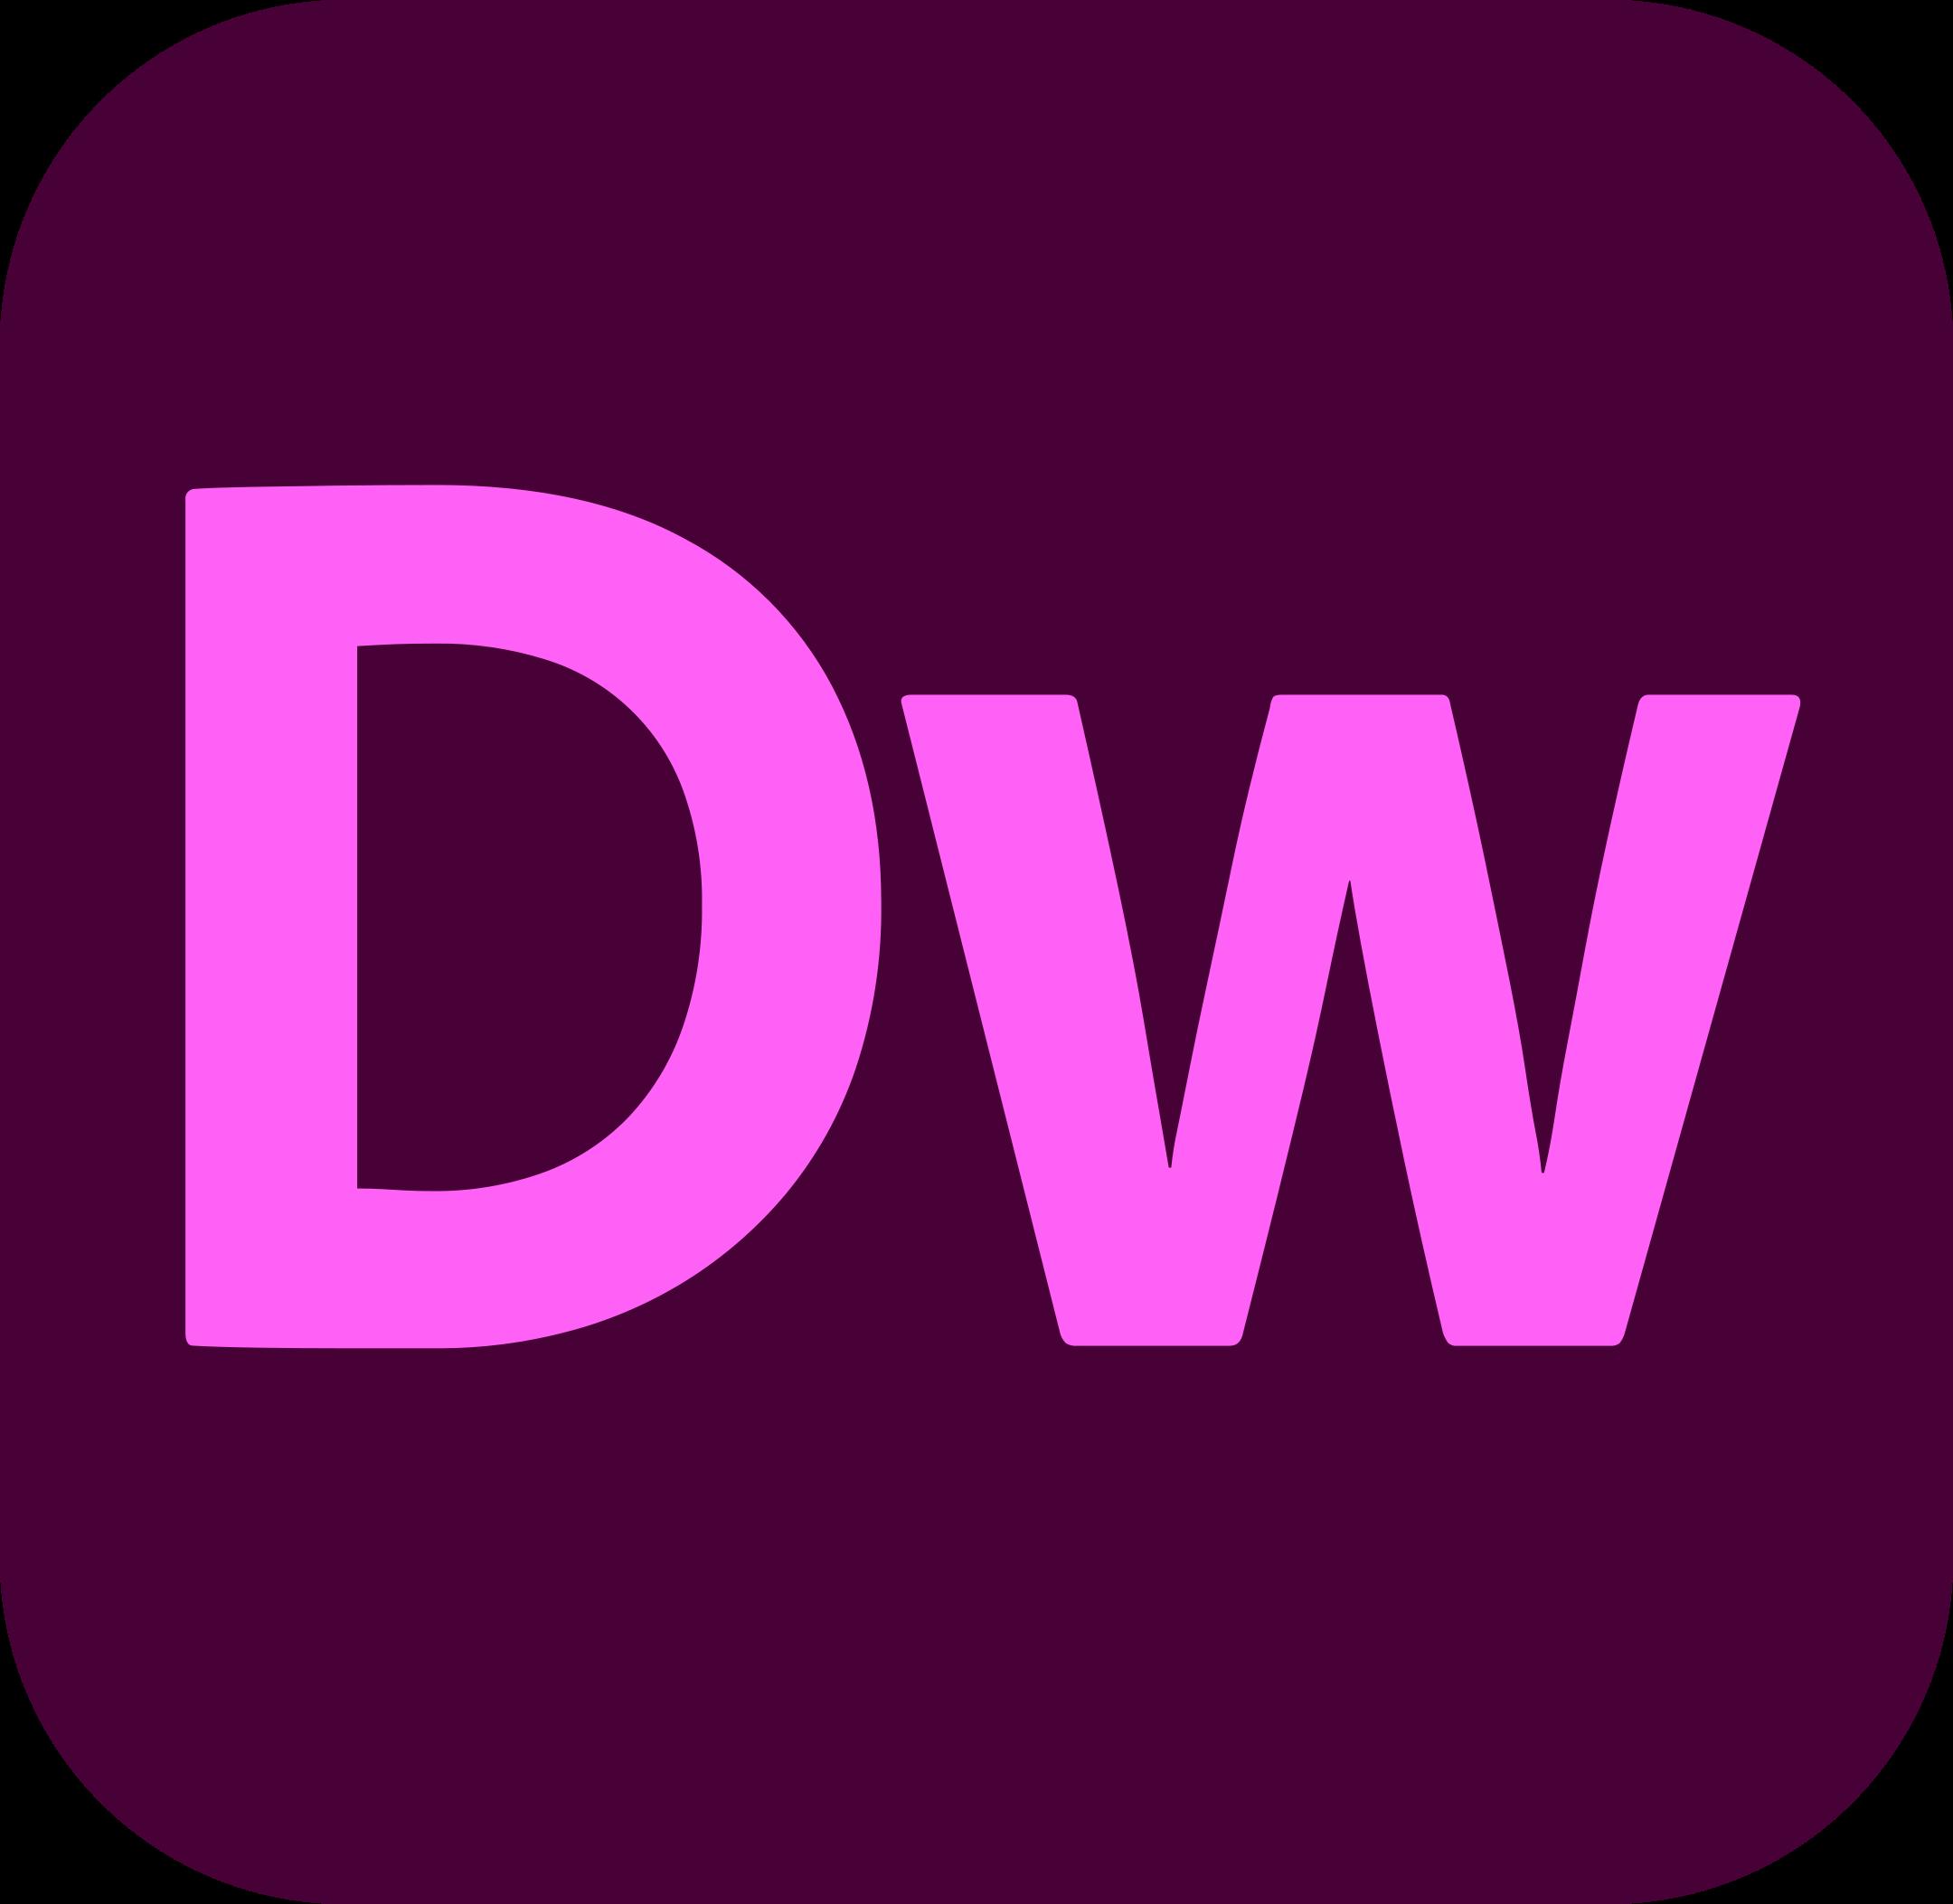 adobe dreamweaver logo 1 1 - Adobe Dreamweaver Logo